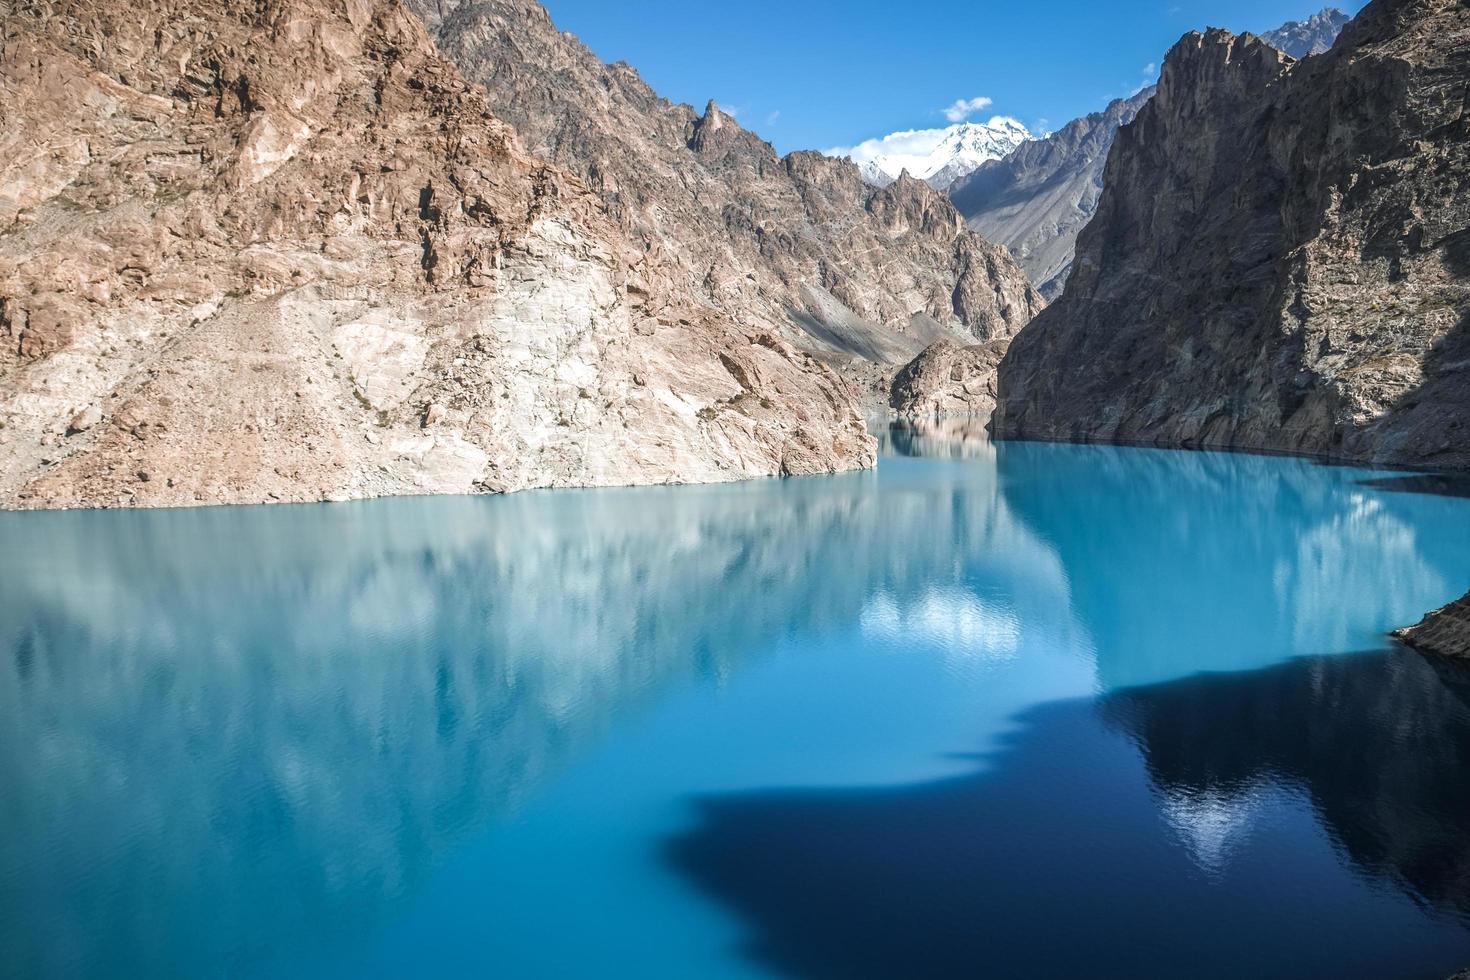 Lago Attabad nella catena montuosa del Karakoram, Pakistan foto